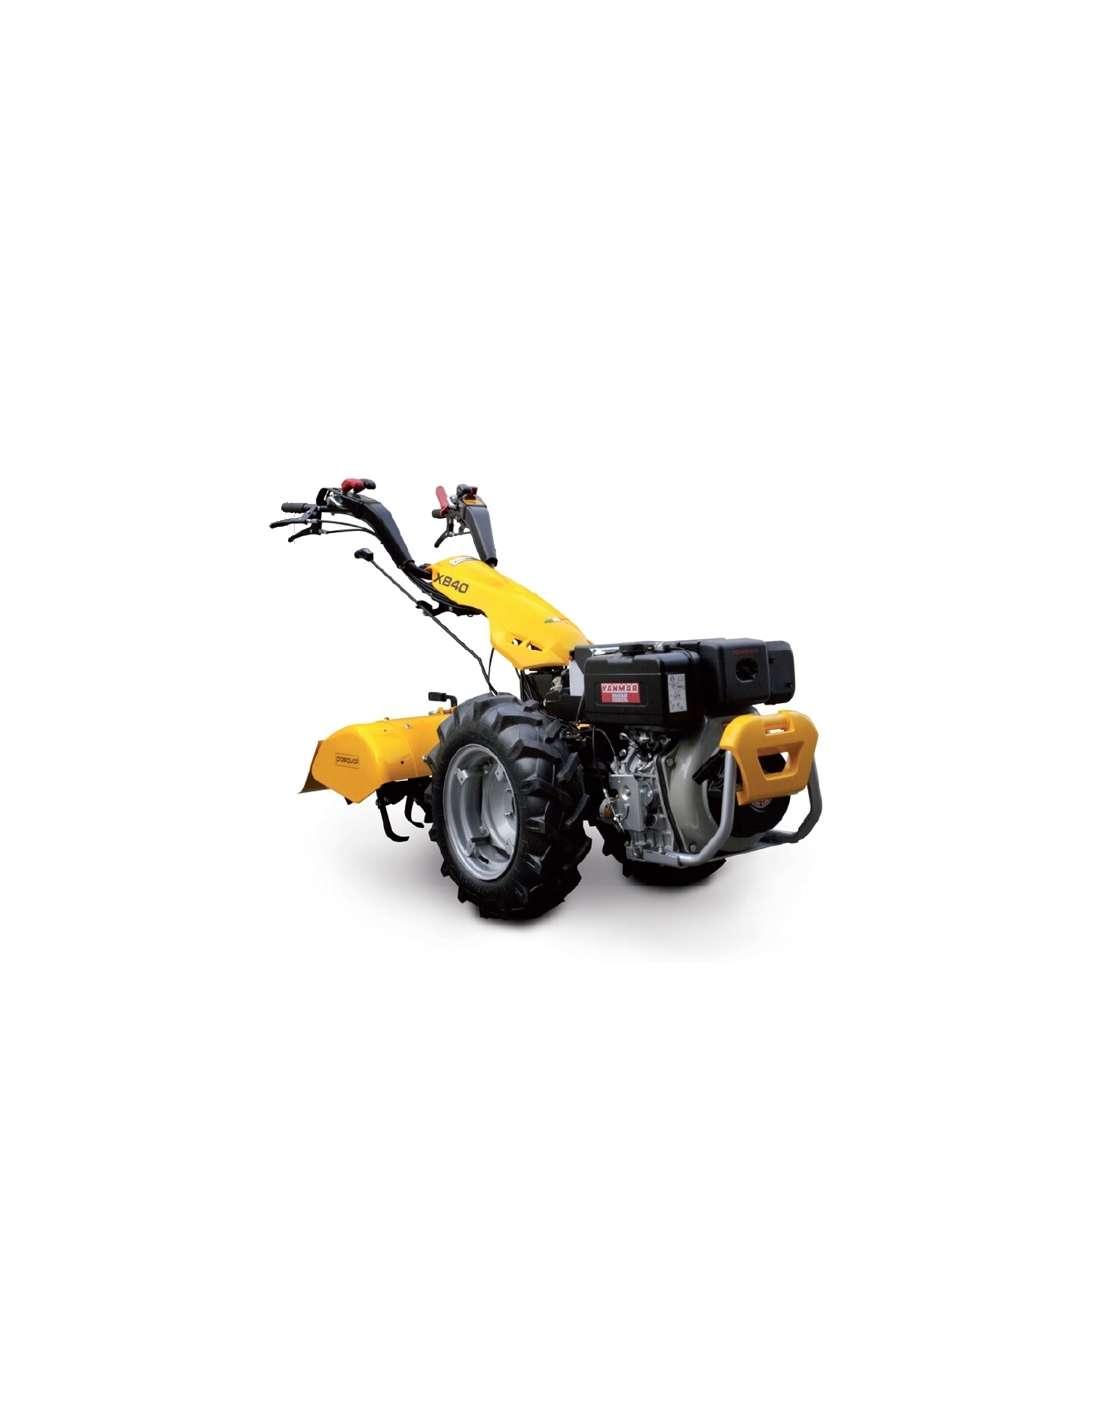 Motocultor pasquali xb40 powersafe agroarenas - Motocultor segunda mano ...